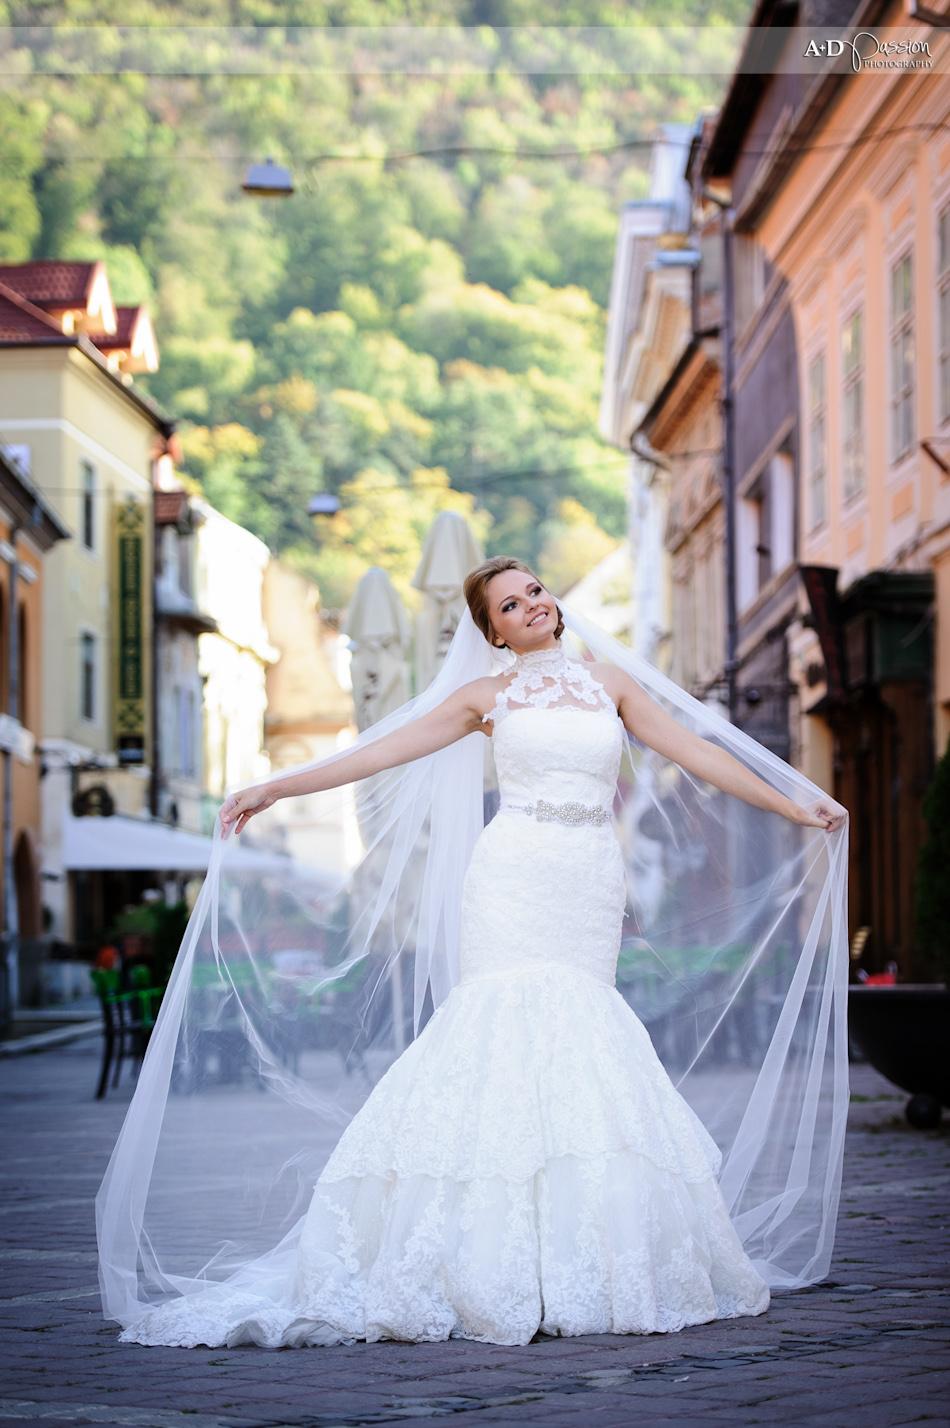 AD Passion Photography | ad-passion_fotograf-profesionist-nunta_poiana-brasov_after-wedding_trash-the-dress_nunta-brasov_fine-art-photography_iusti-si-antonia_0071 | Adelin, Dida, fotograf profesionist, fotograf de nunta, fotografie de nunta, fotograf Timisoara, fotograf Craiova, fotograf Bucuresti, fotograf Arad, nunta Timisoara, nunta Arad, nunta Bucuresti, nunta Craiova